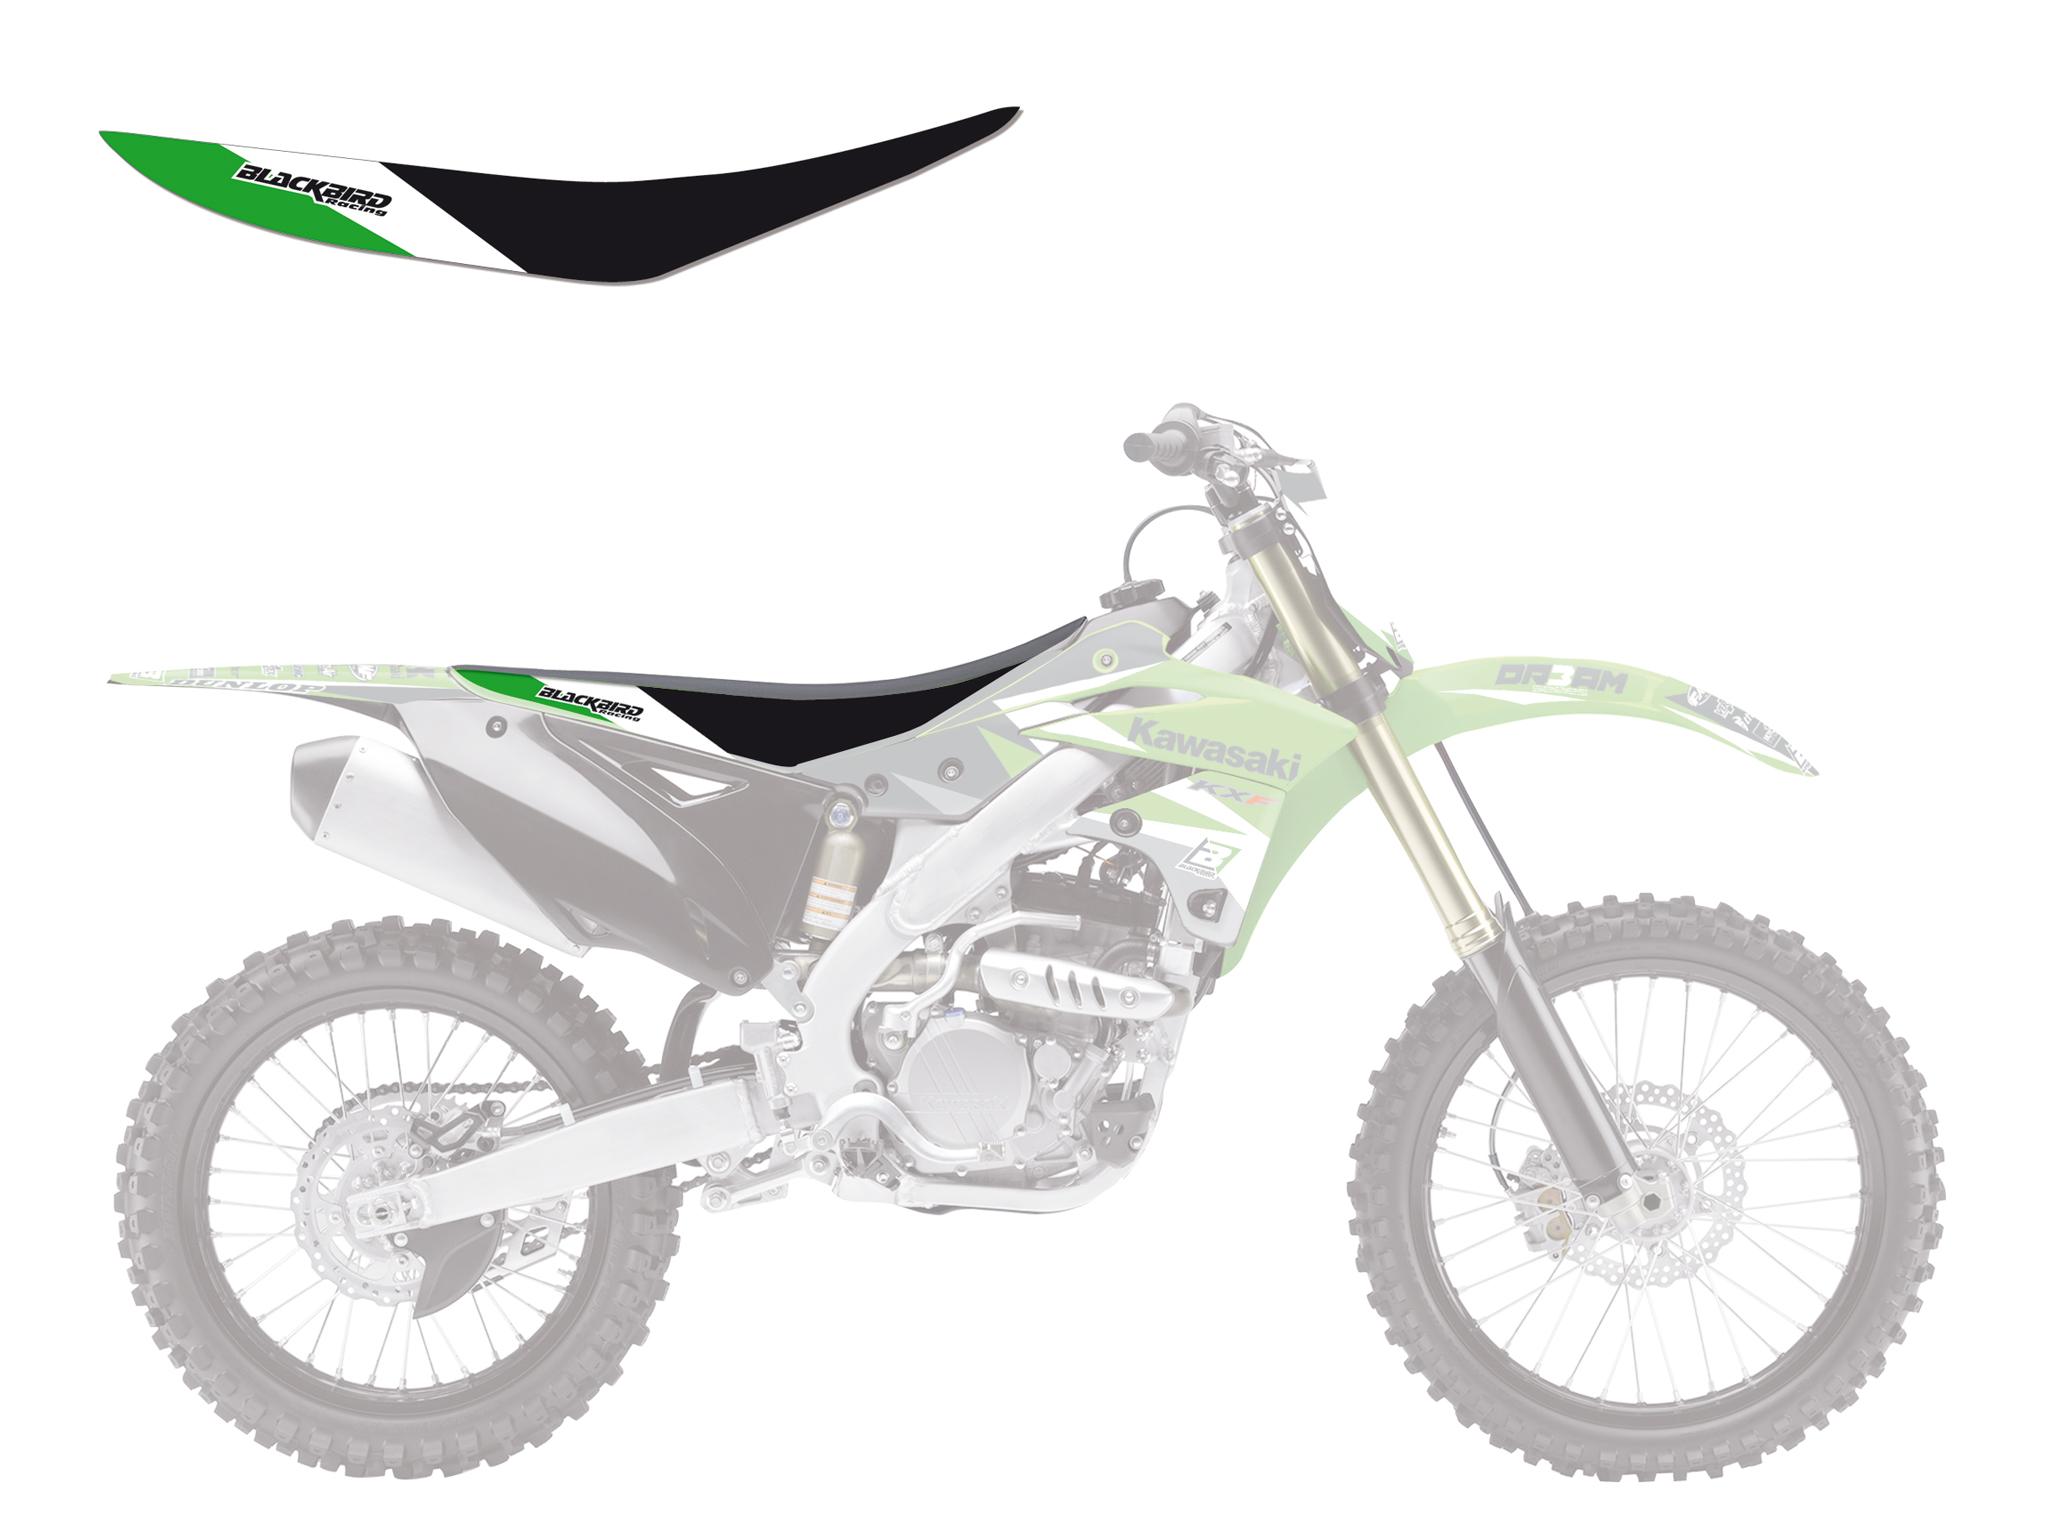 kit deco graphic 3 kawasaki 125 250 kx 1994 1998 crossmoto fr 13 09 2017